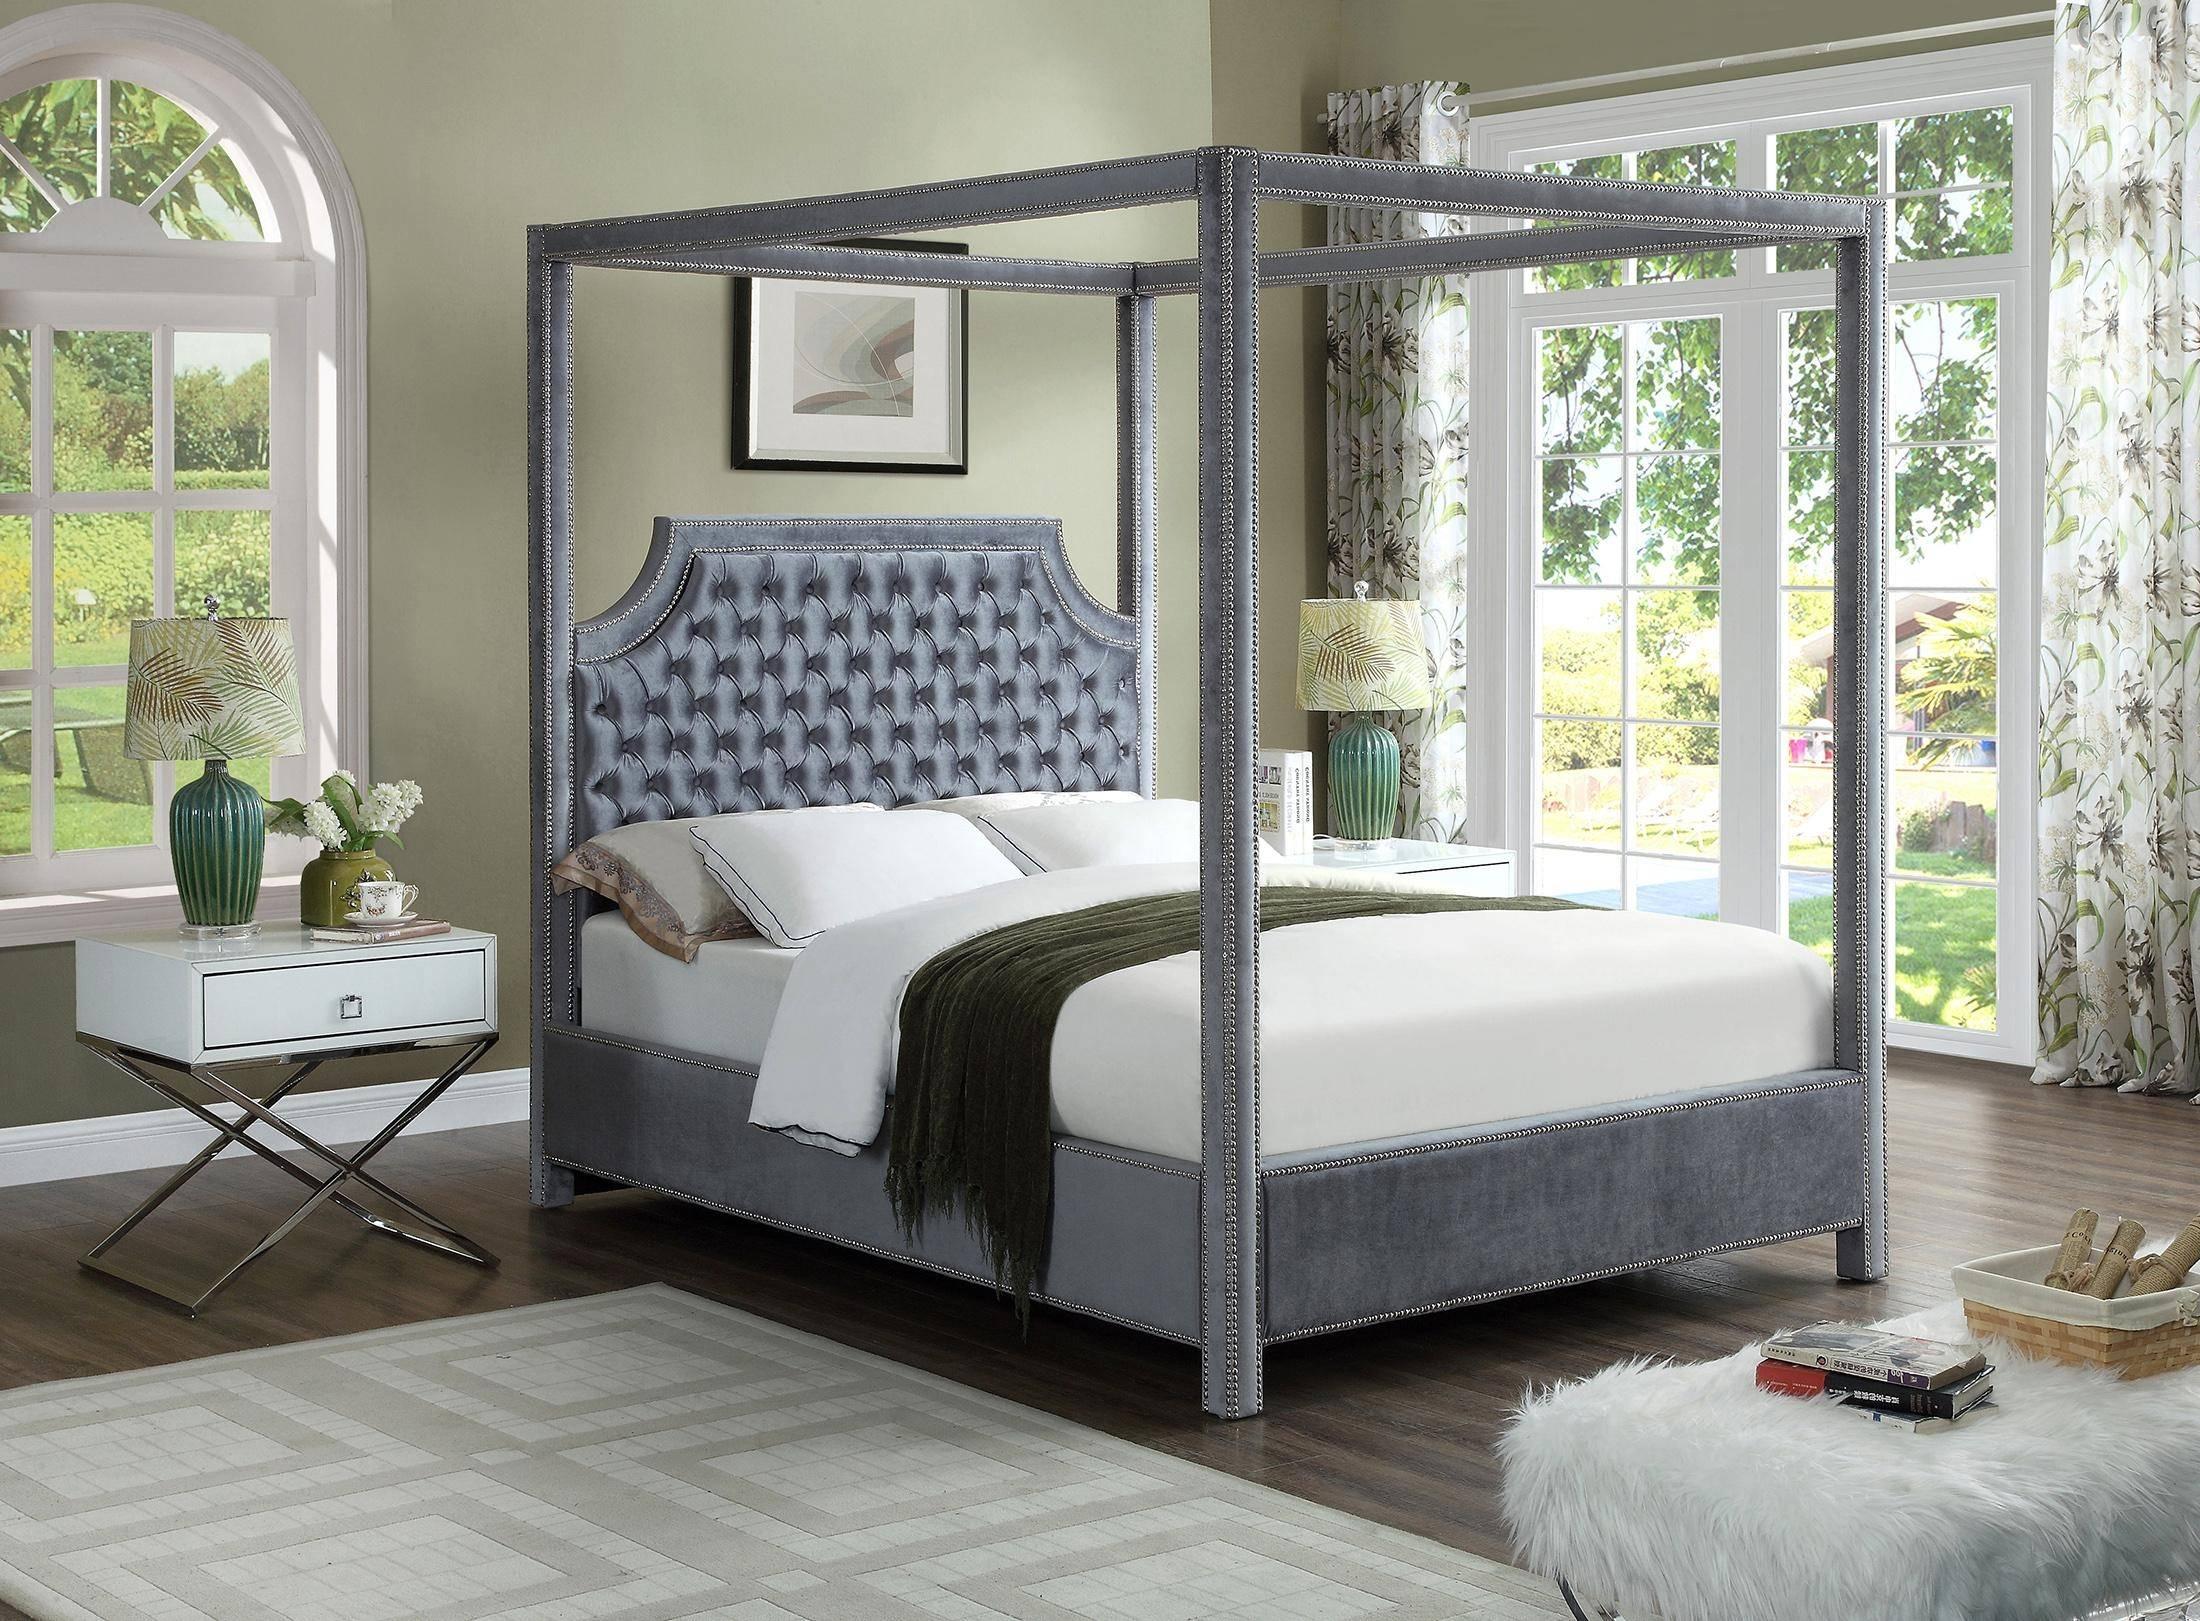 Buy Meridian Rowan Lynn Queen Canopy Bedroom Set 3 Pcs In Gray Velvet Online